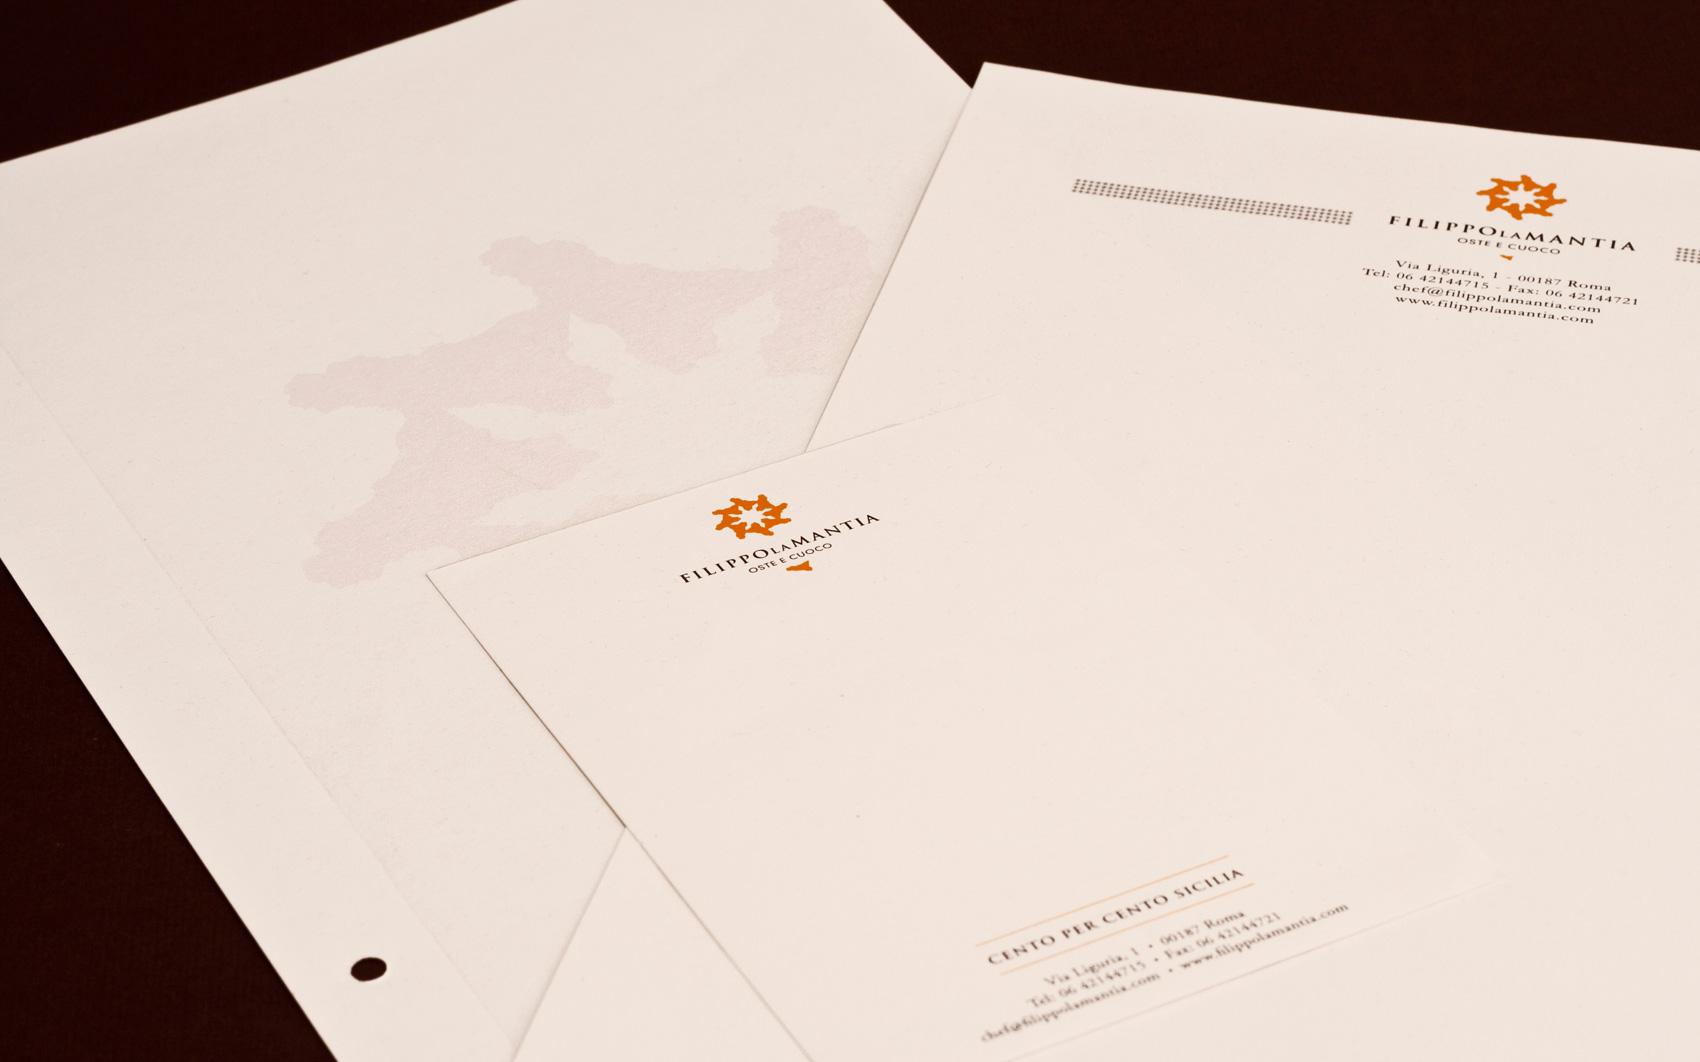 Filippo La Mantia Rebranding - Letterheads